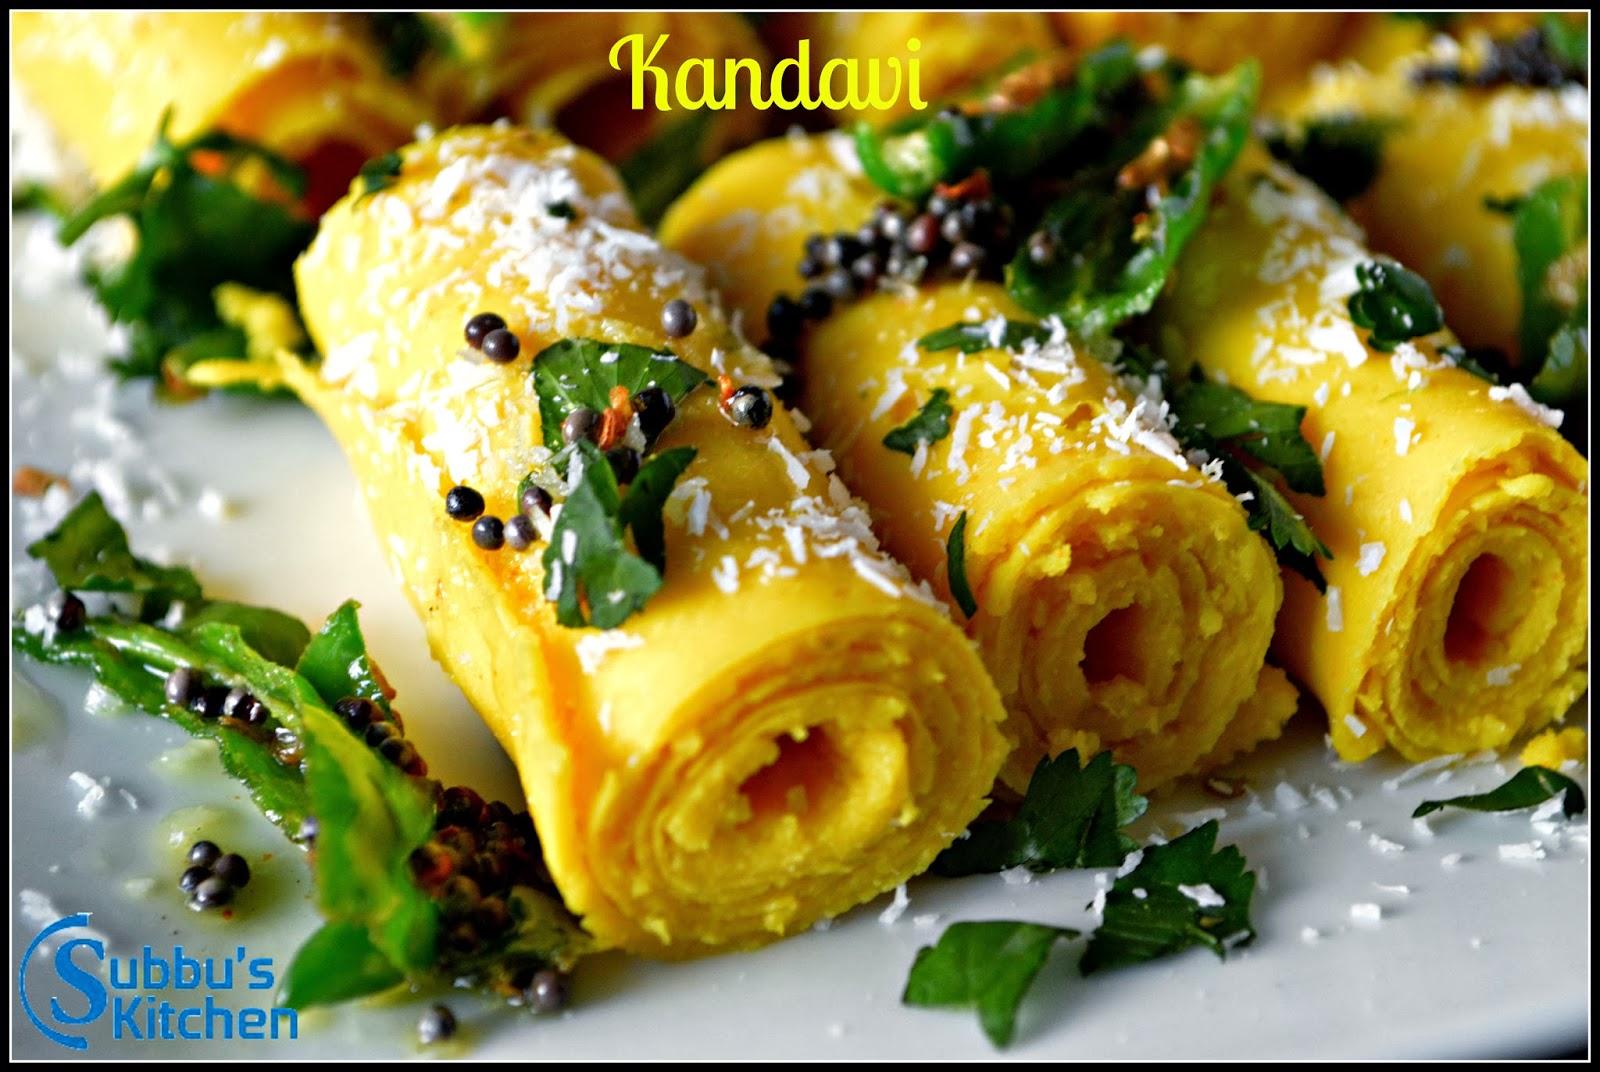 Khandavi